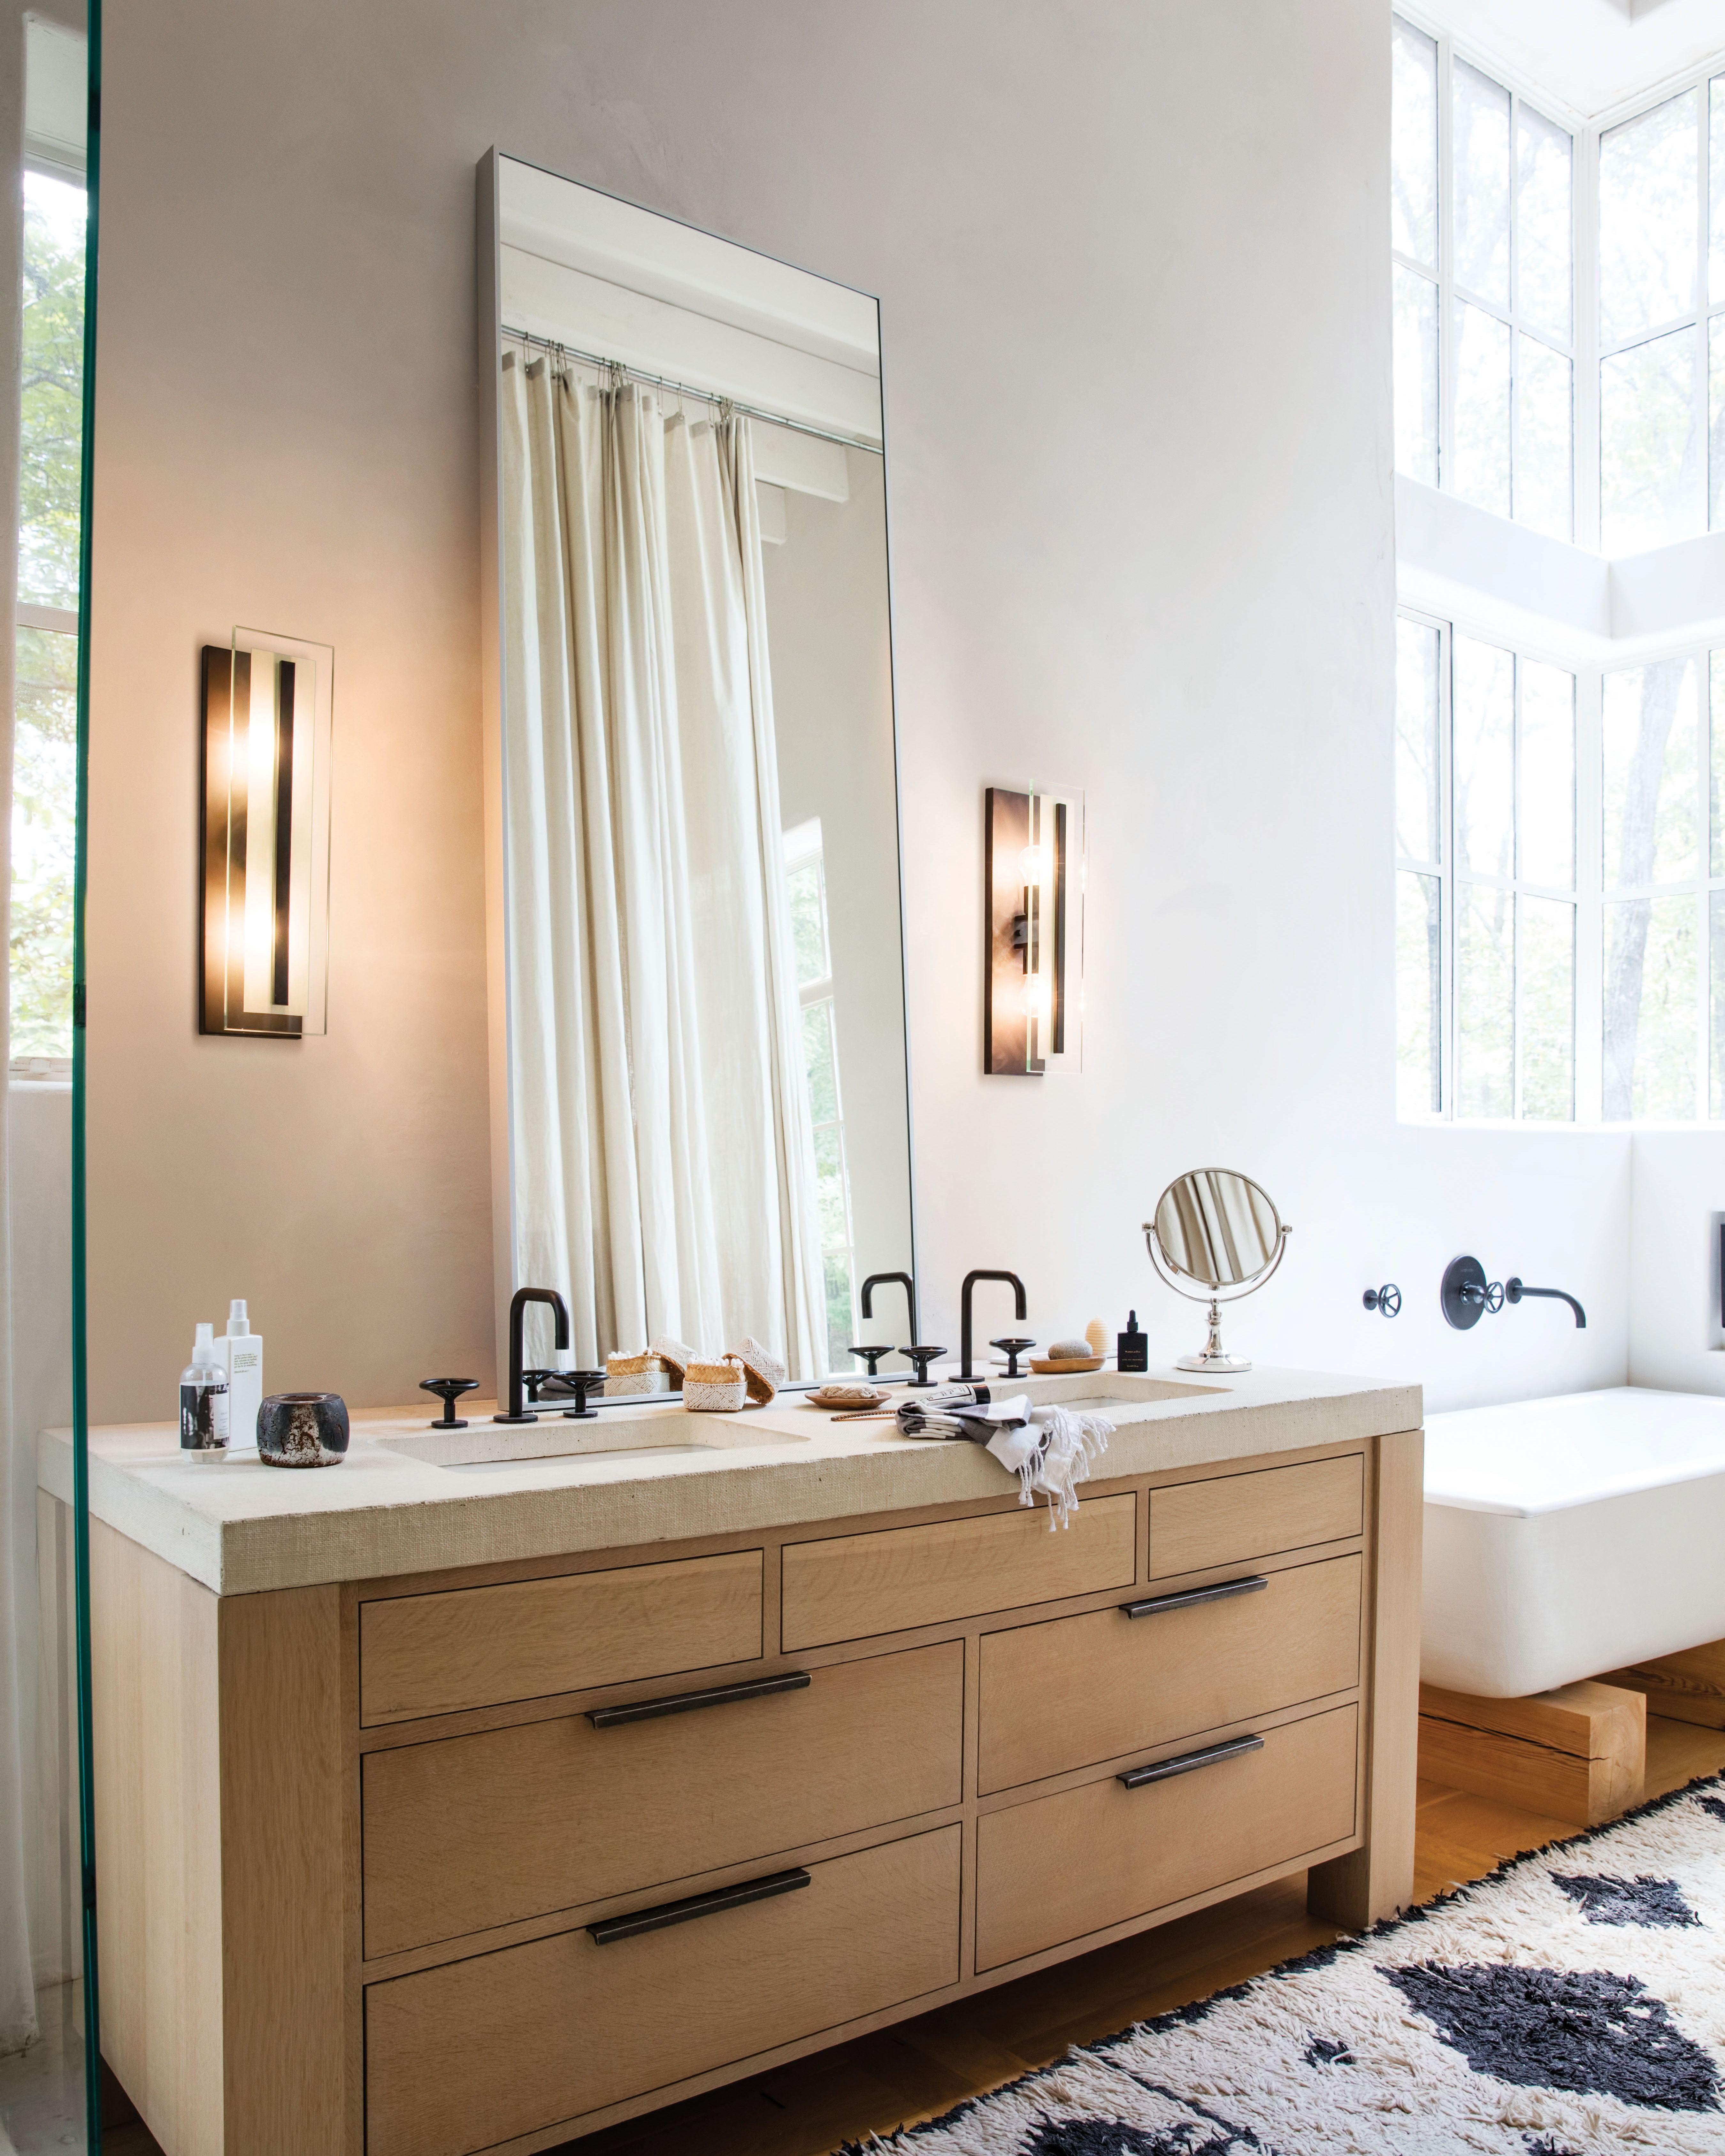 Bathroom Design In 2020 Top Bathroom Design Bathroom Interior Design Bathroom Inspiration Modern